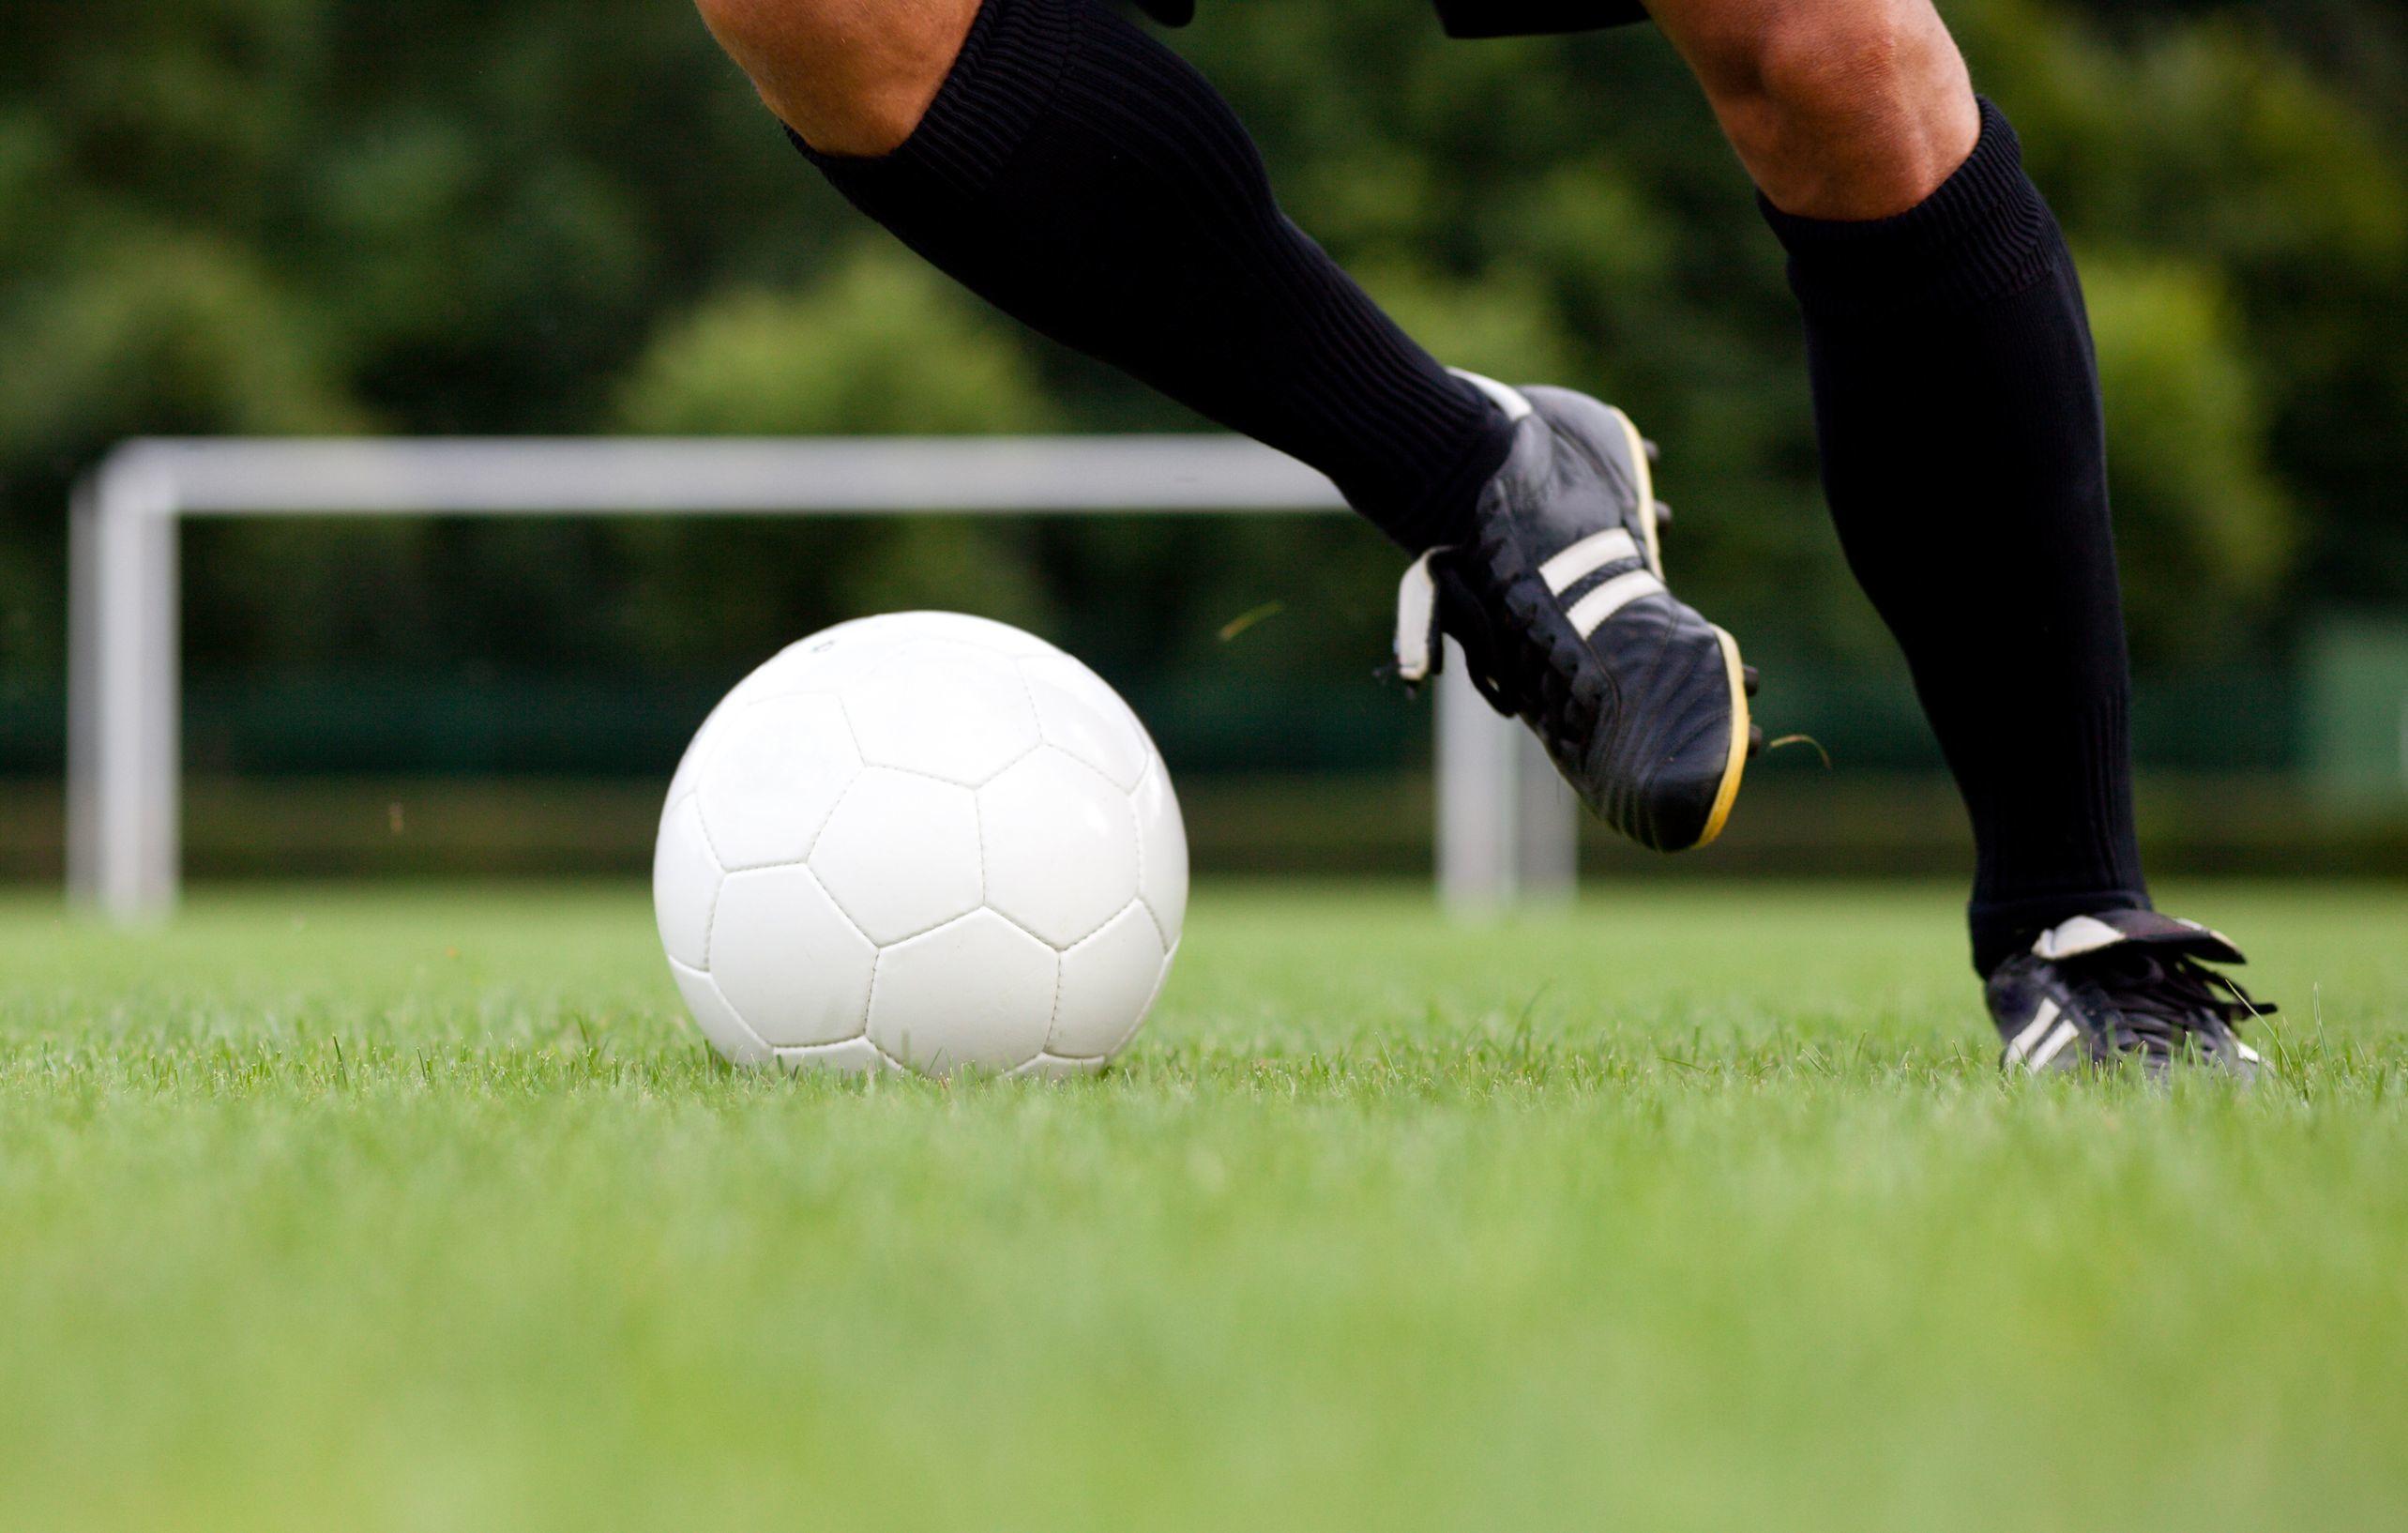 Weekly Football Phrase: Double the advantage